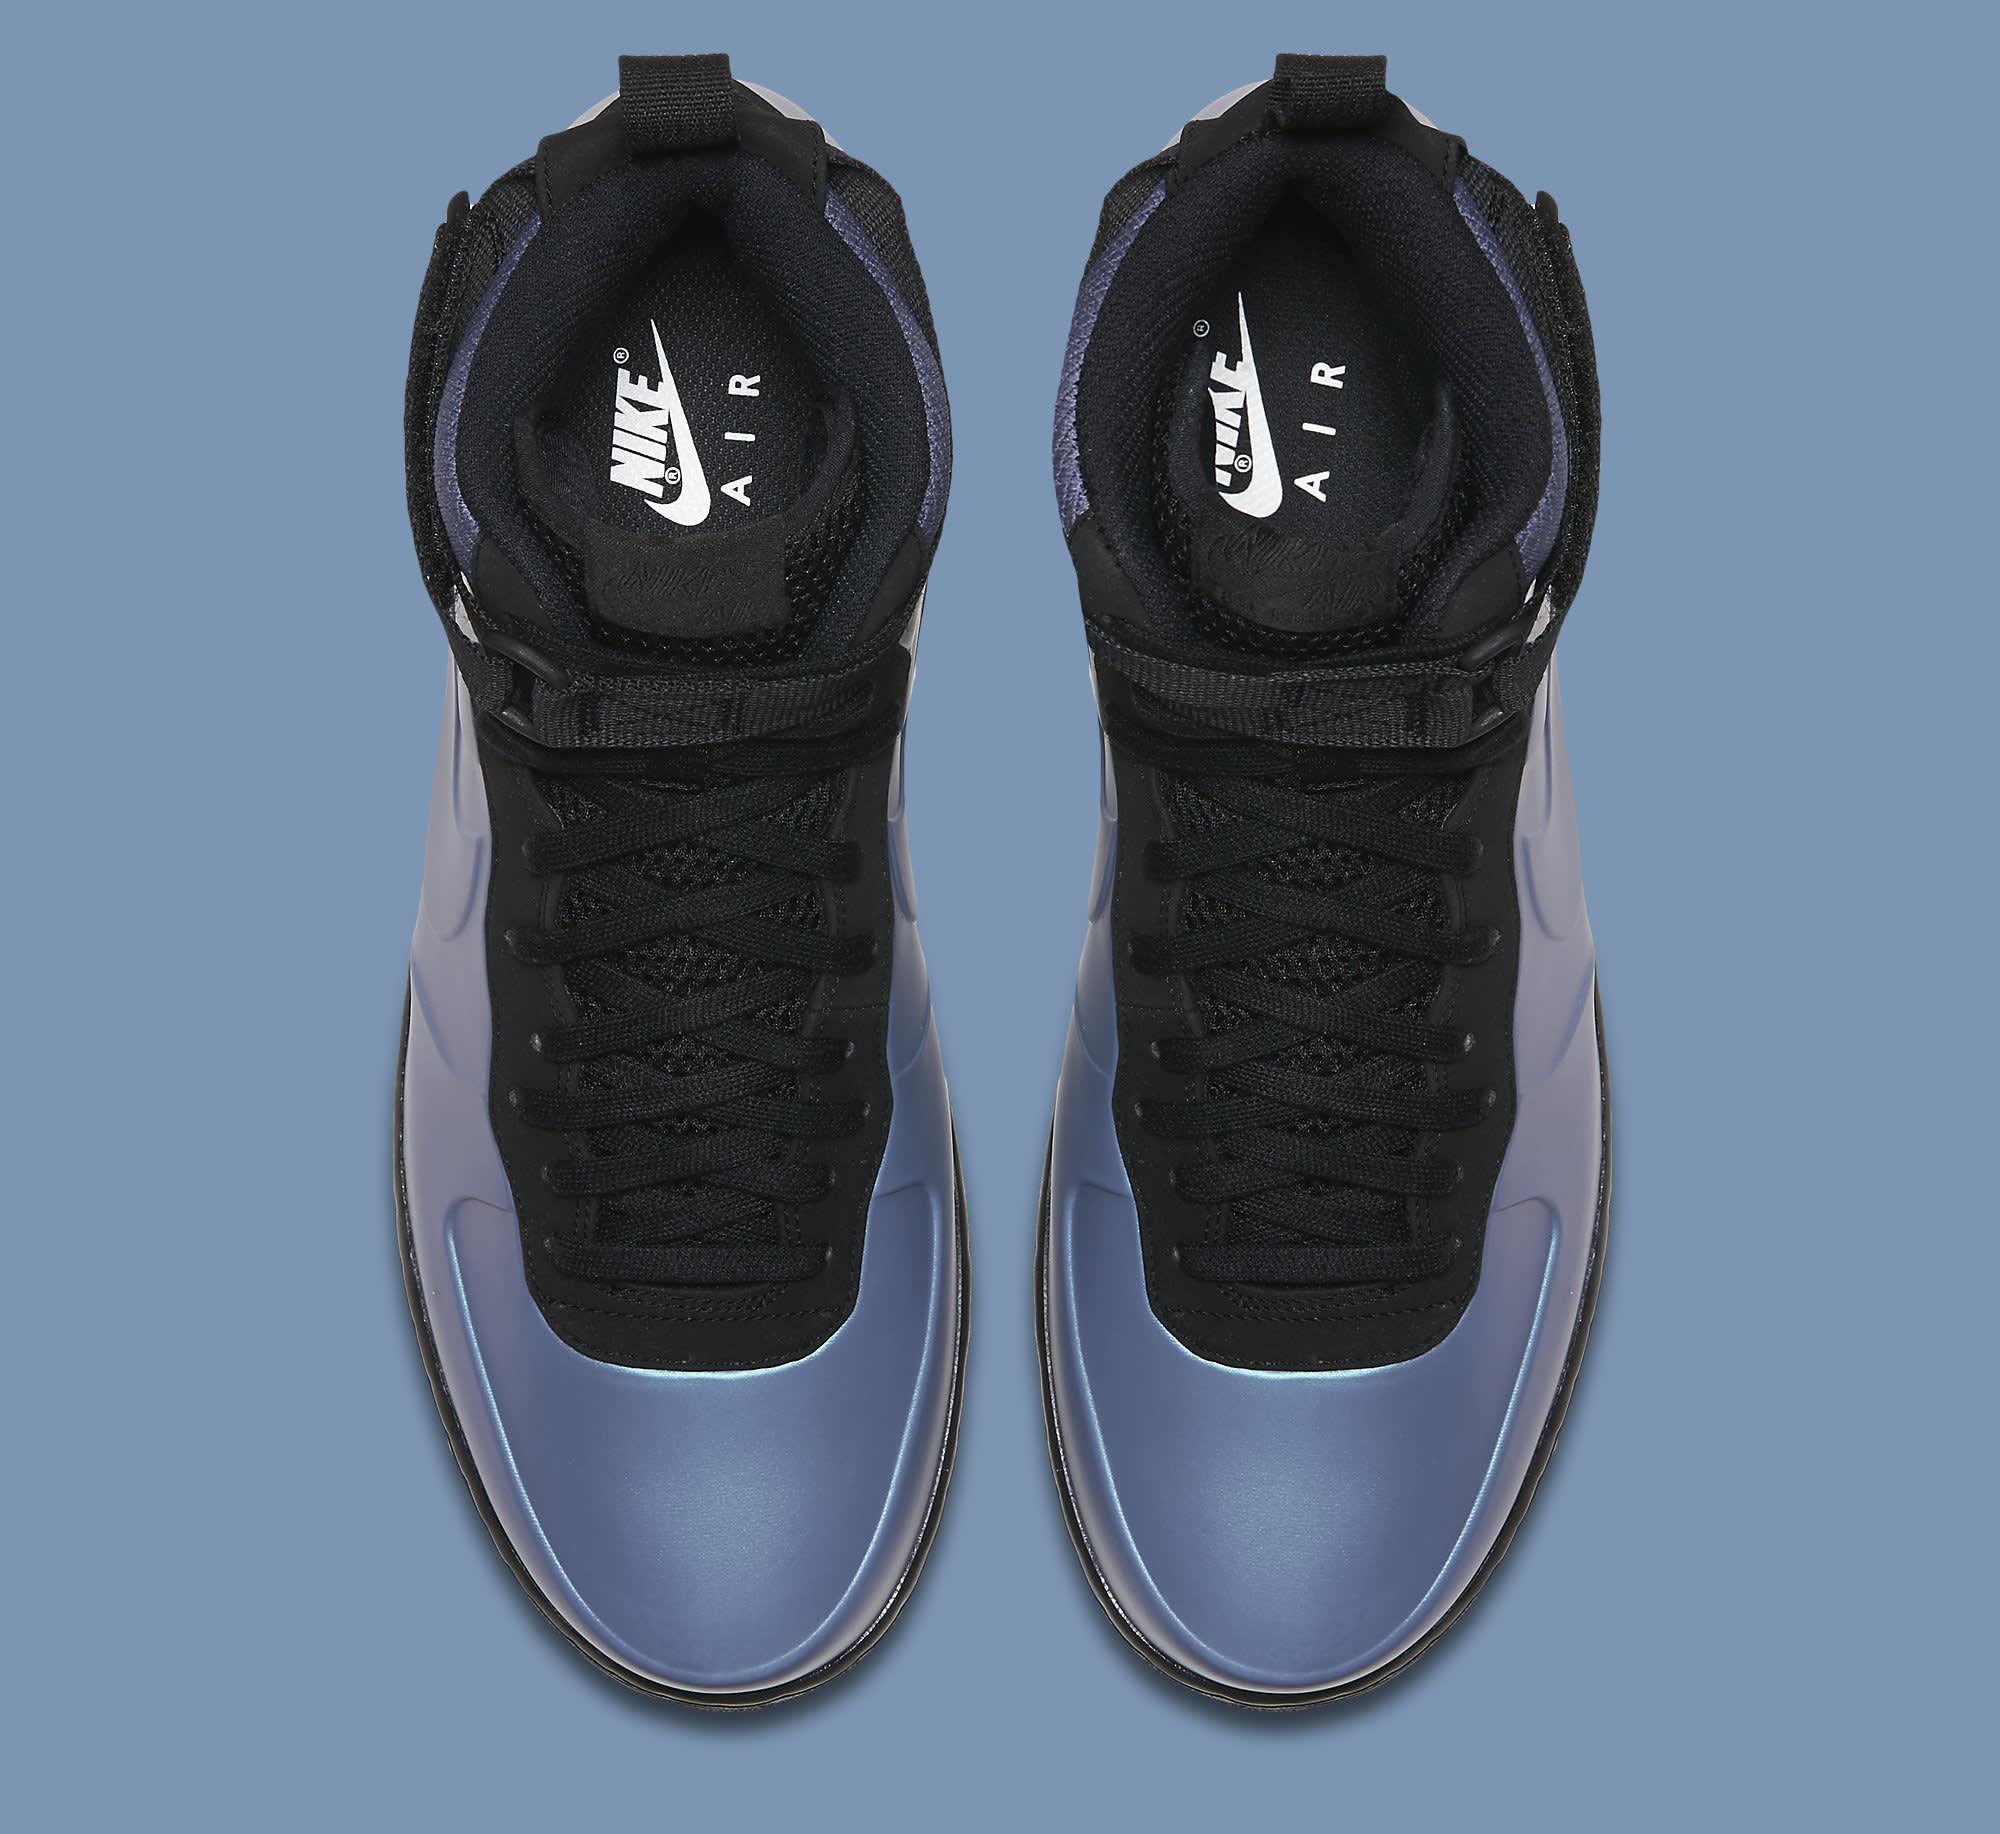 Nike Air Force 1 Foamposite Light Carbon AH6771-002 Top